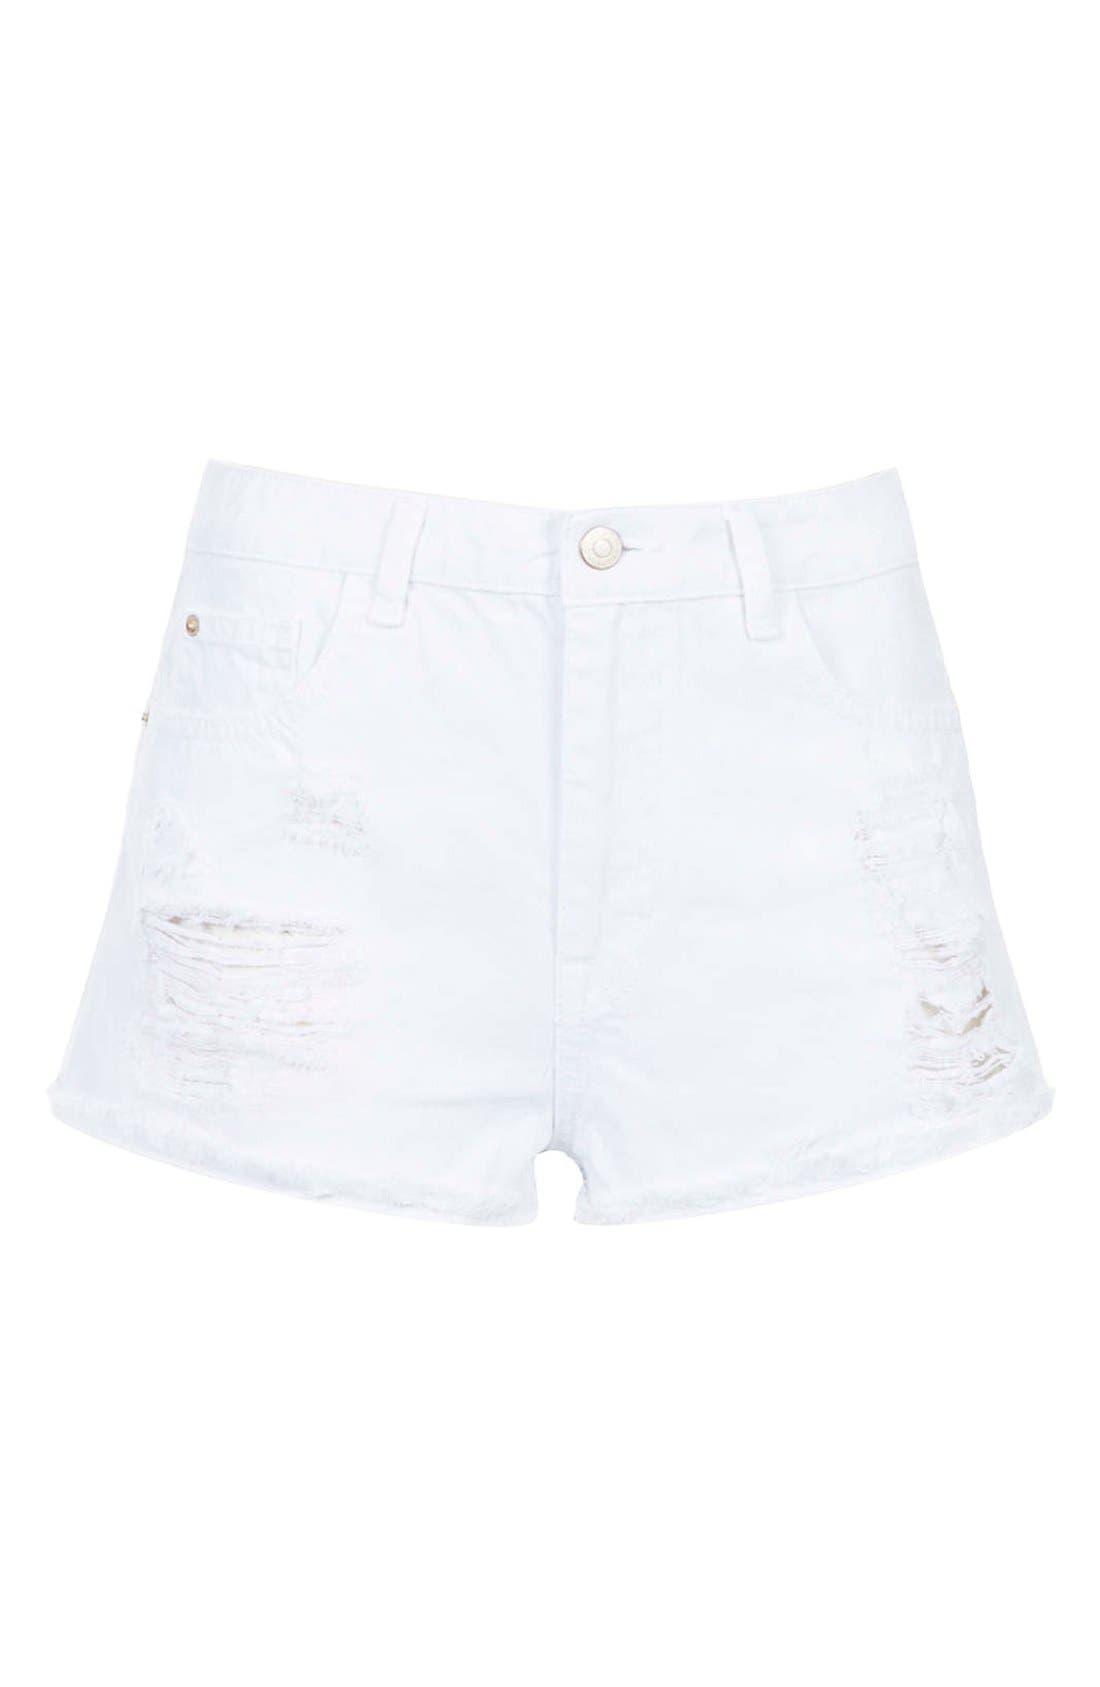 Alternate Image 3  - Topshop Moto 'Hallie' High Rise Denim Shorts (White)